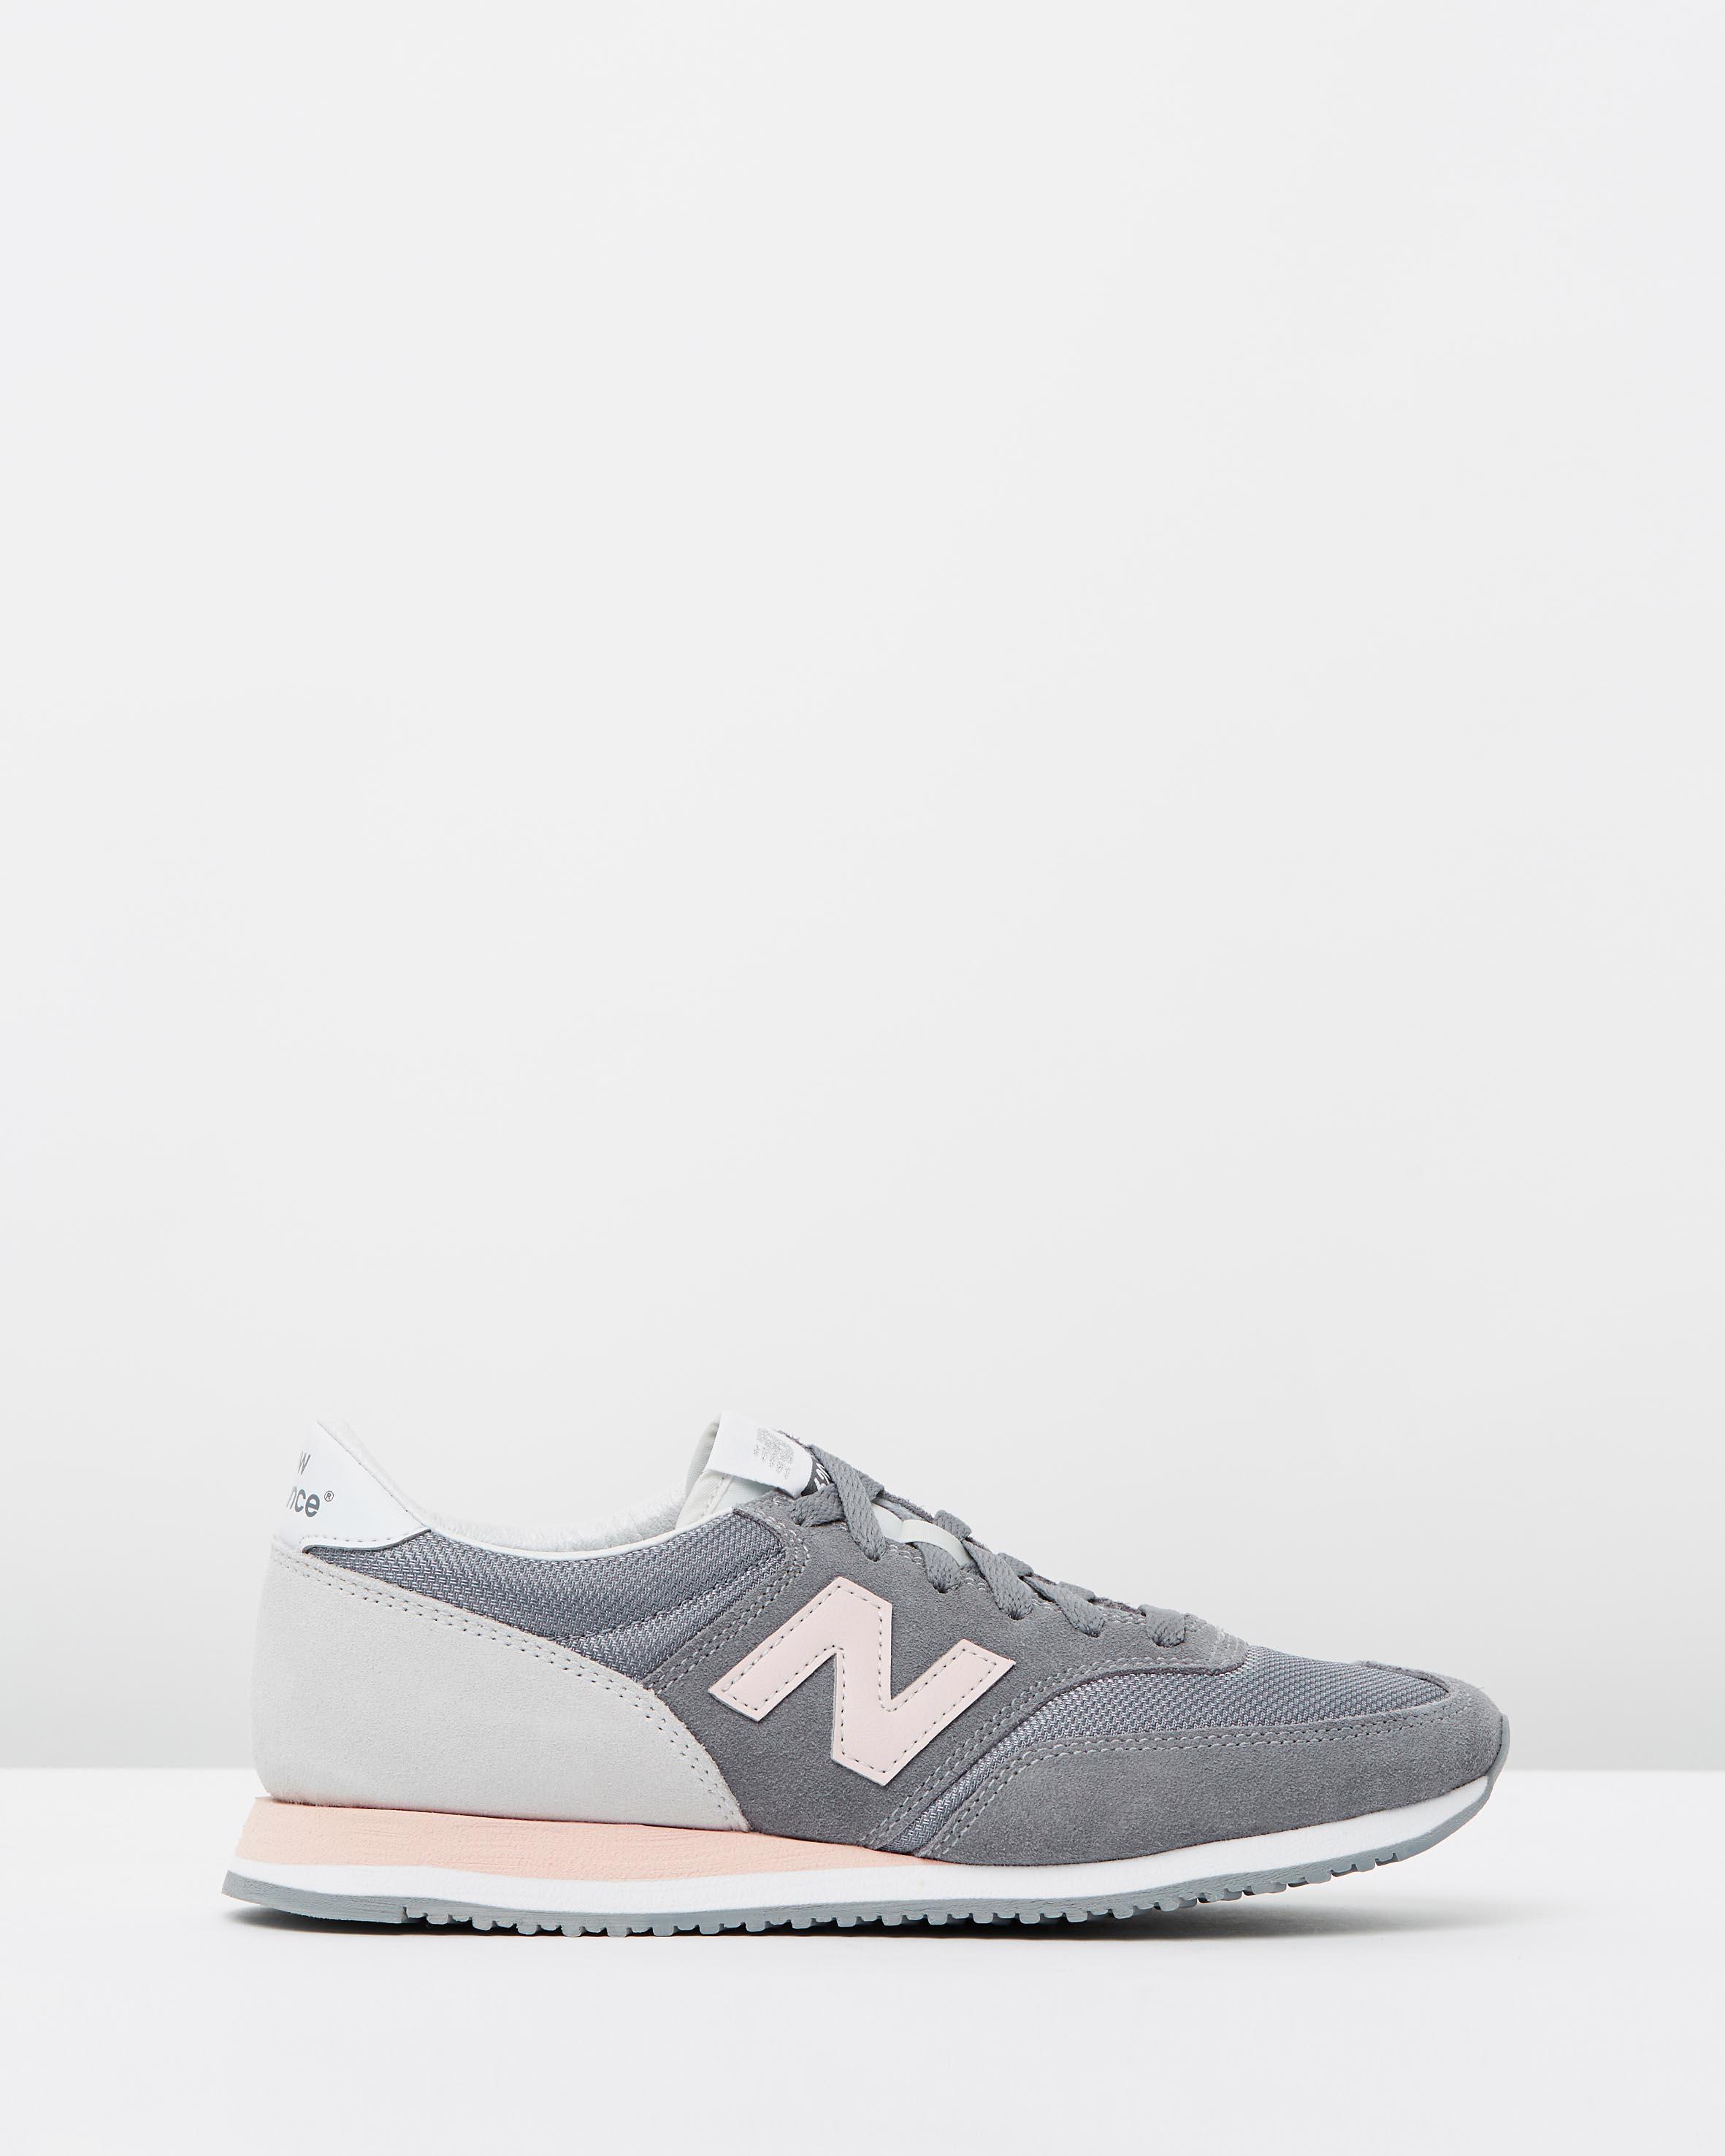 womens new balance sneakers 620